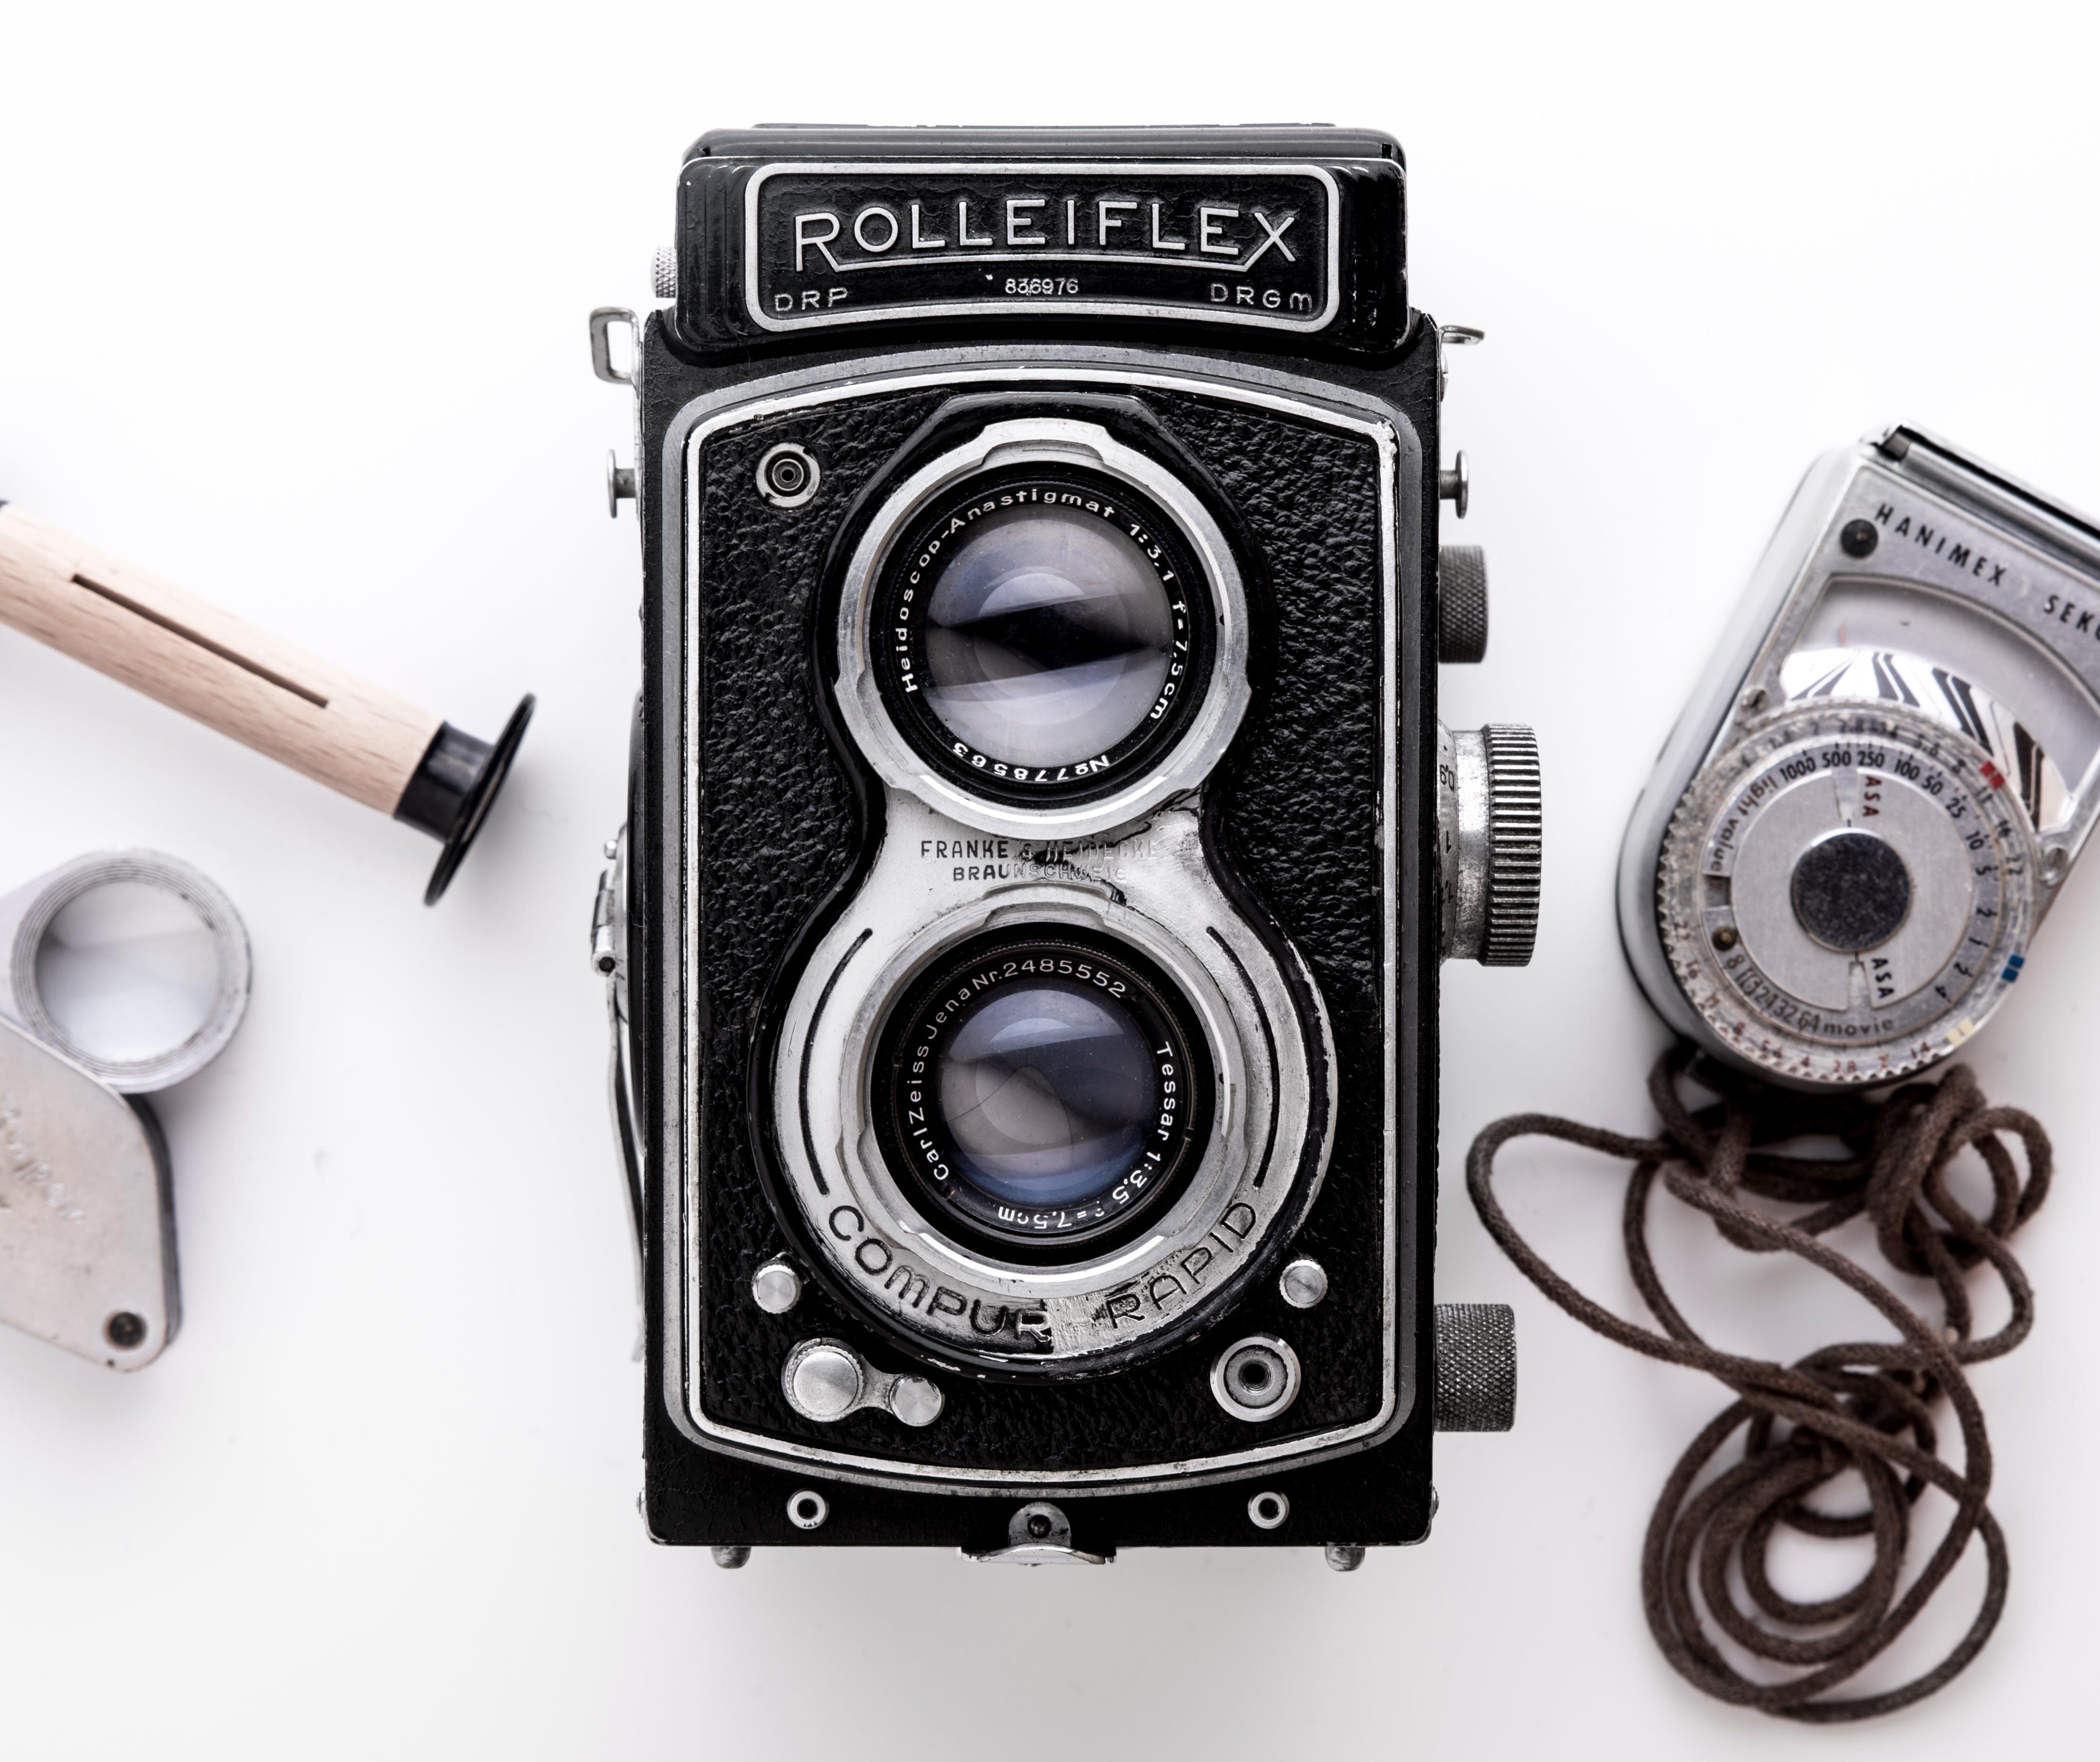 Gratis stockfoto met analoge camera, antiek, binnenshuis, camera